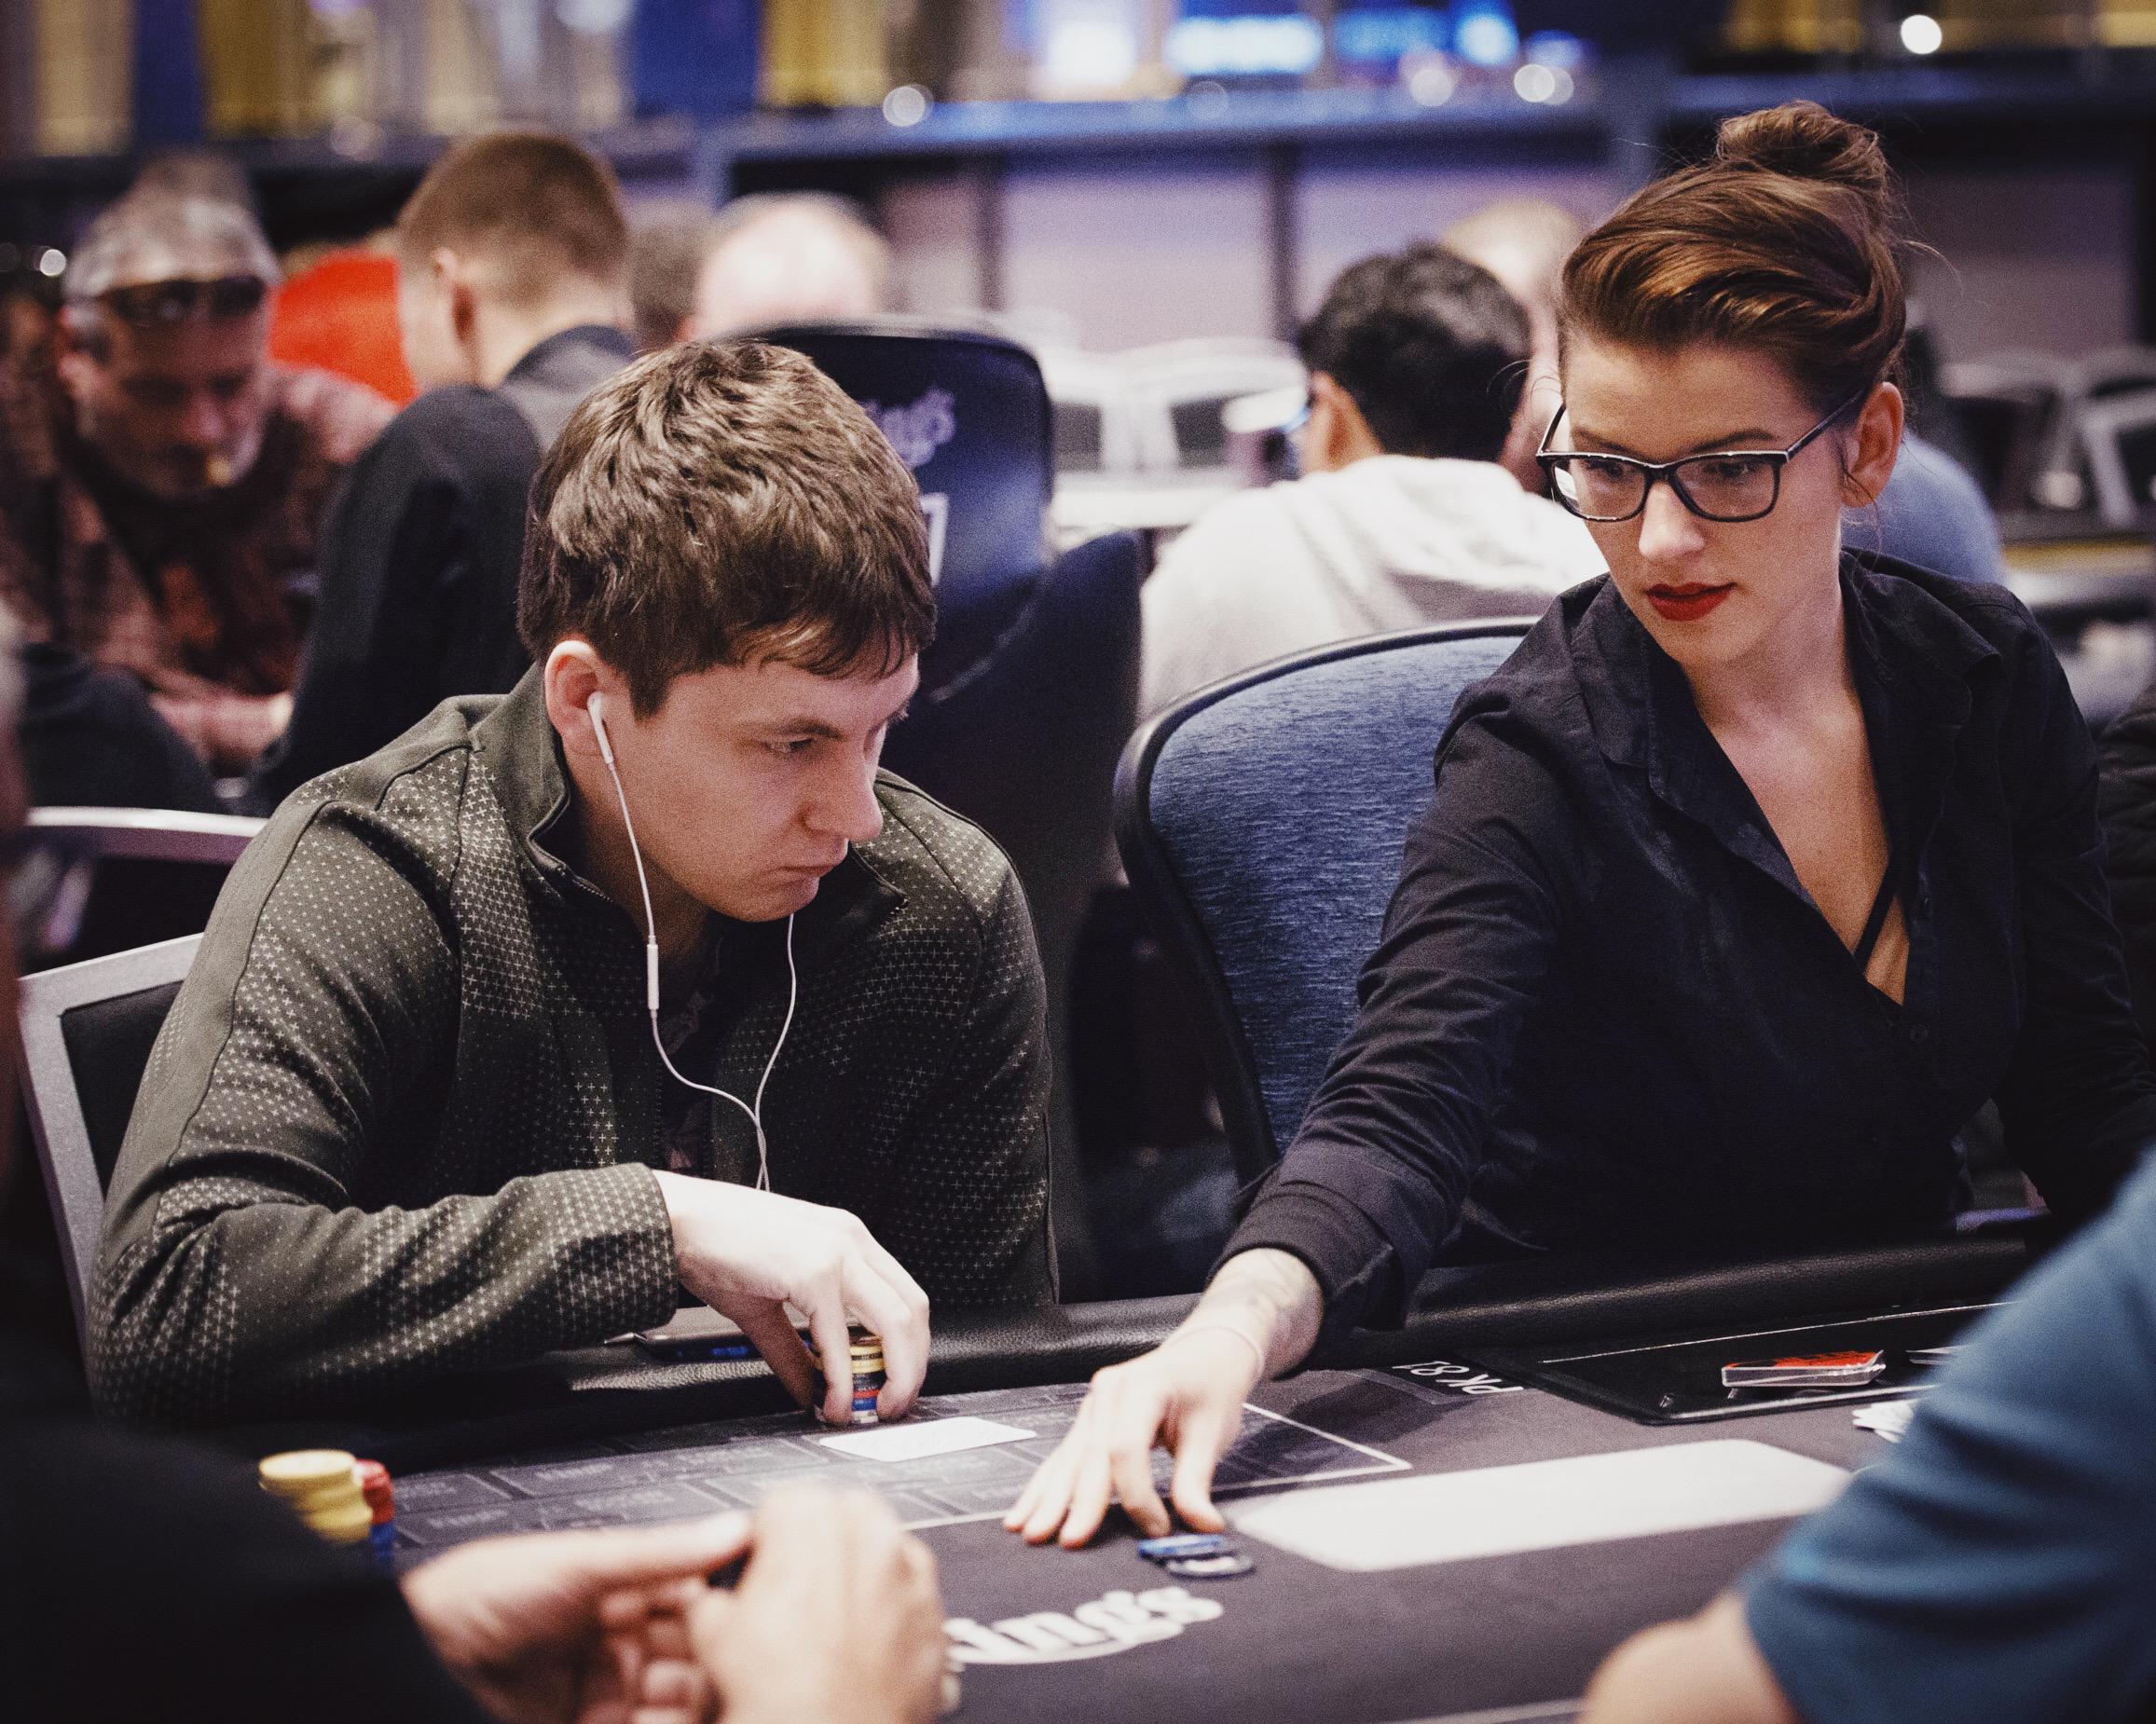 polina-shubkina-poker-002.JPG